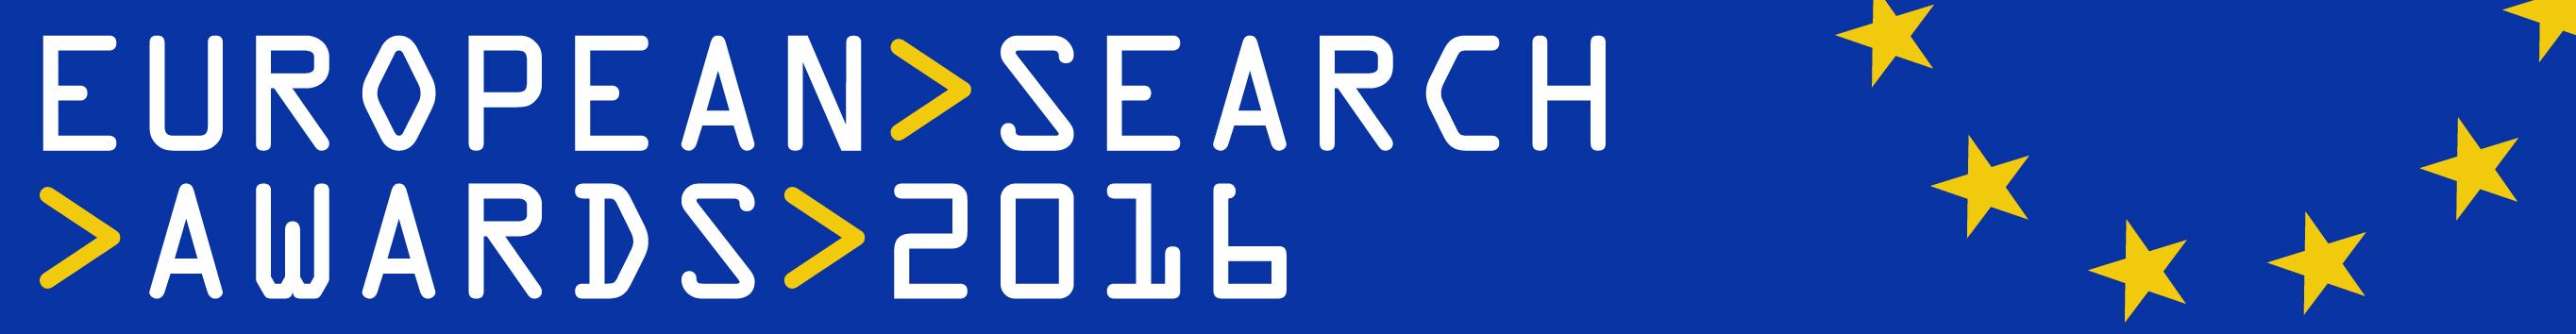 eu_search_2016_dp_ticket_banner-01